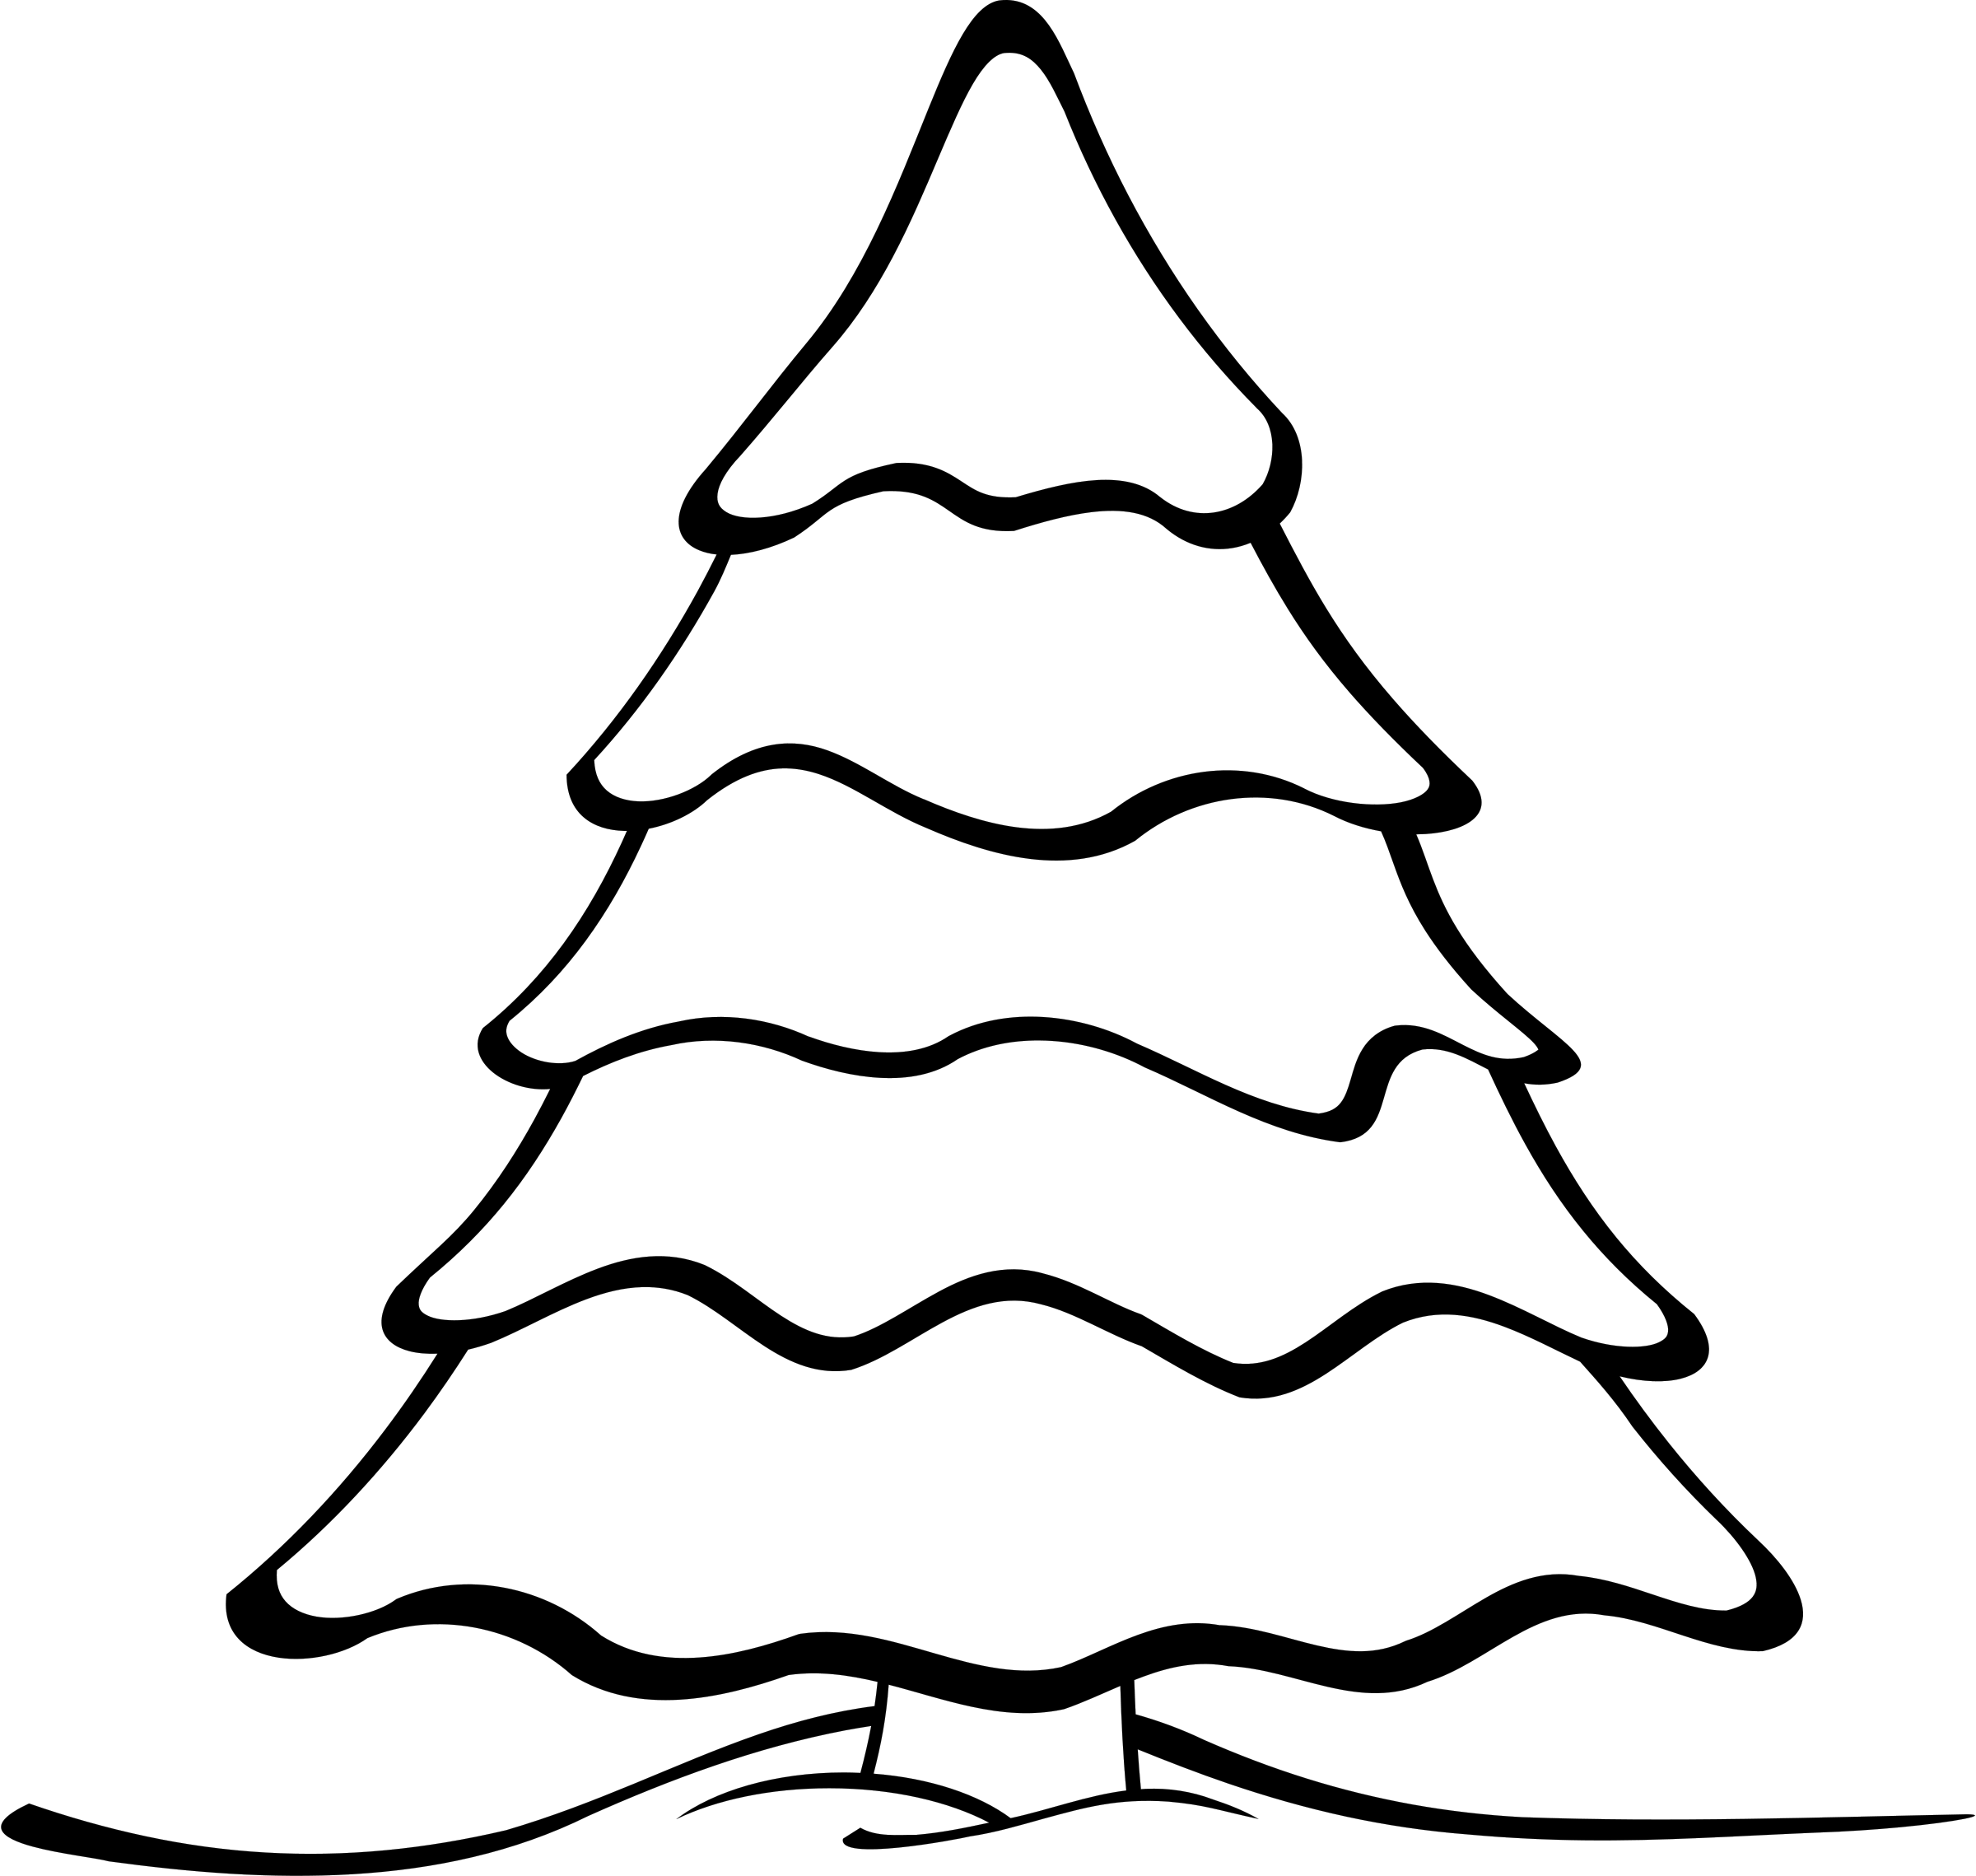 2400x2278 Christmas Star Outline Clipart